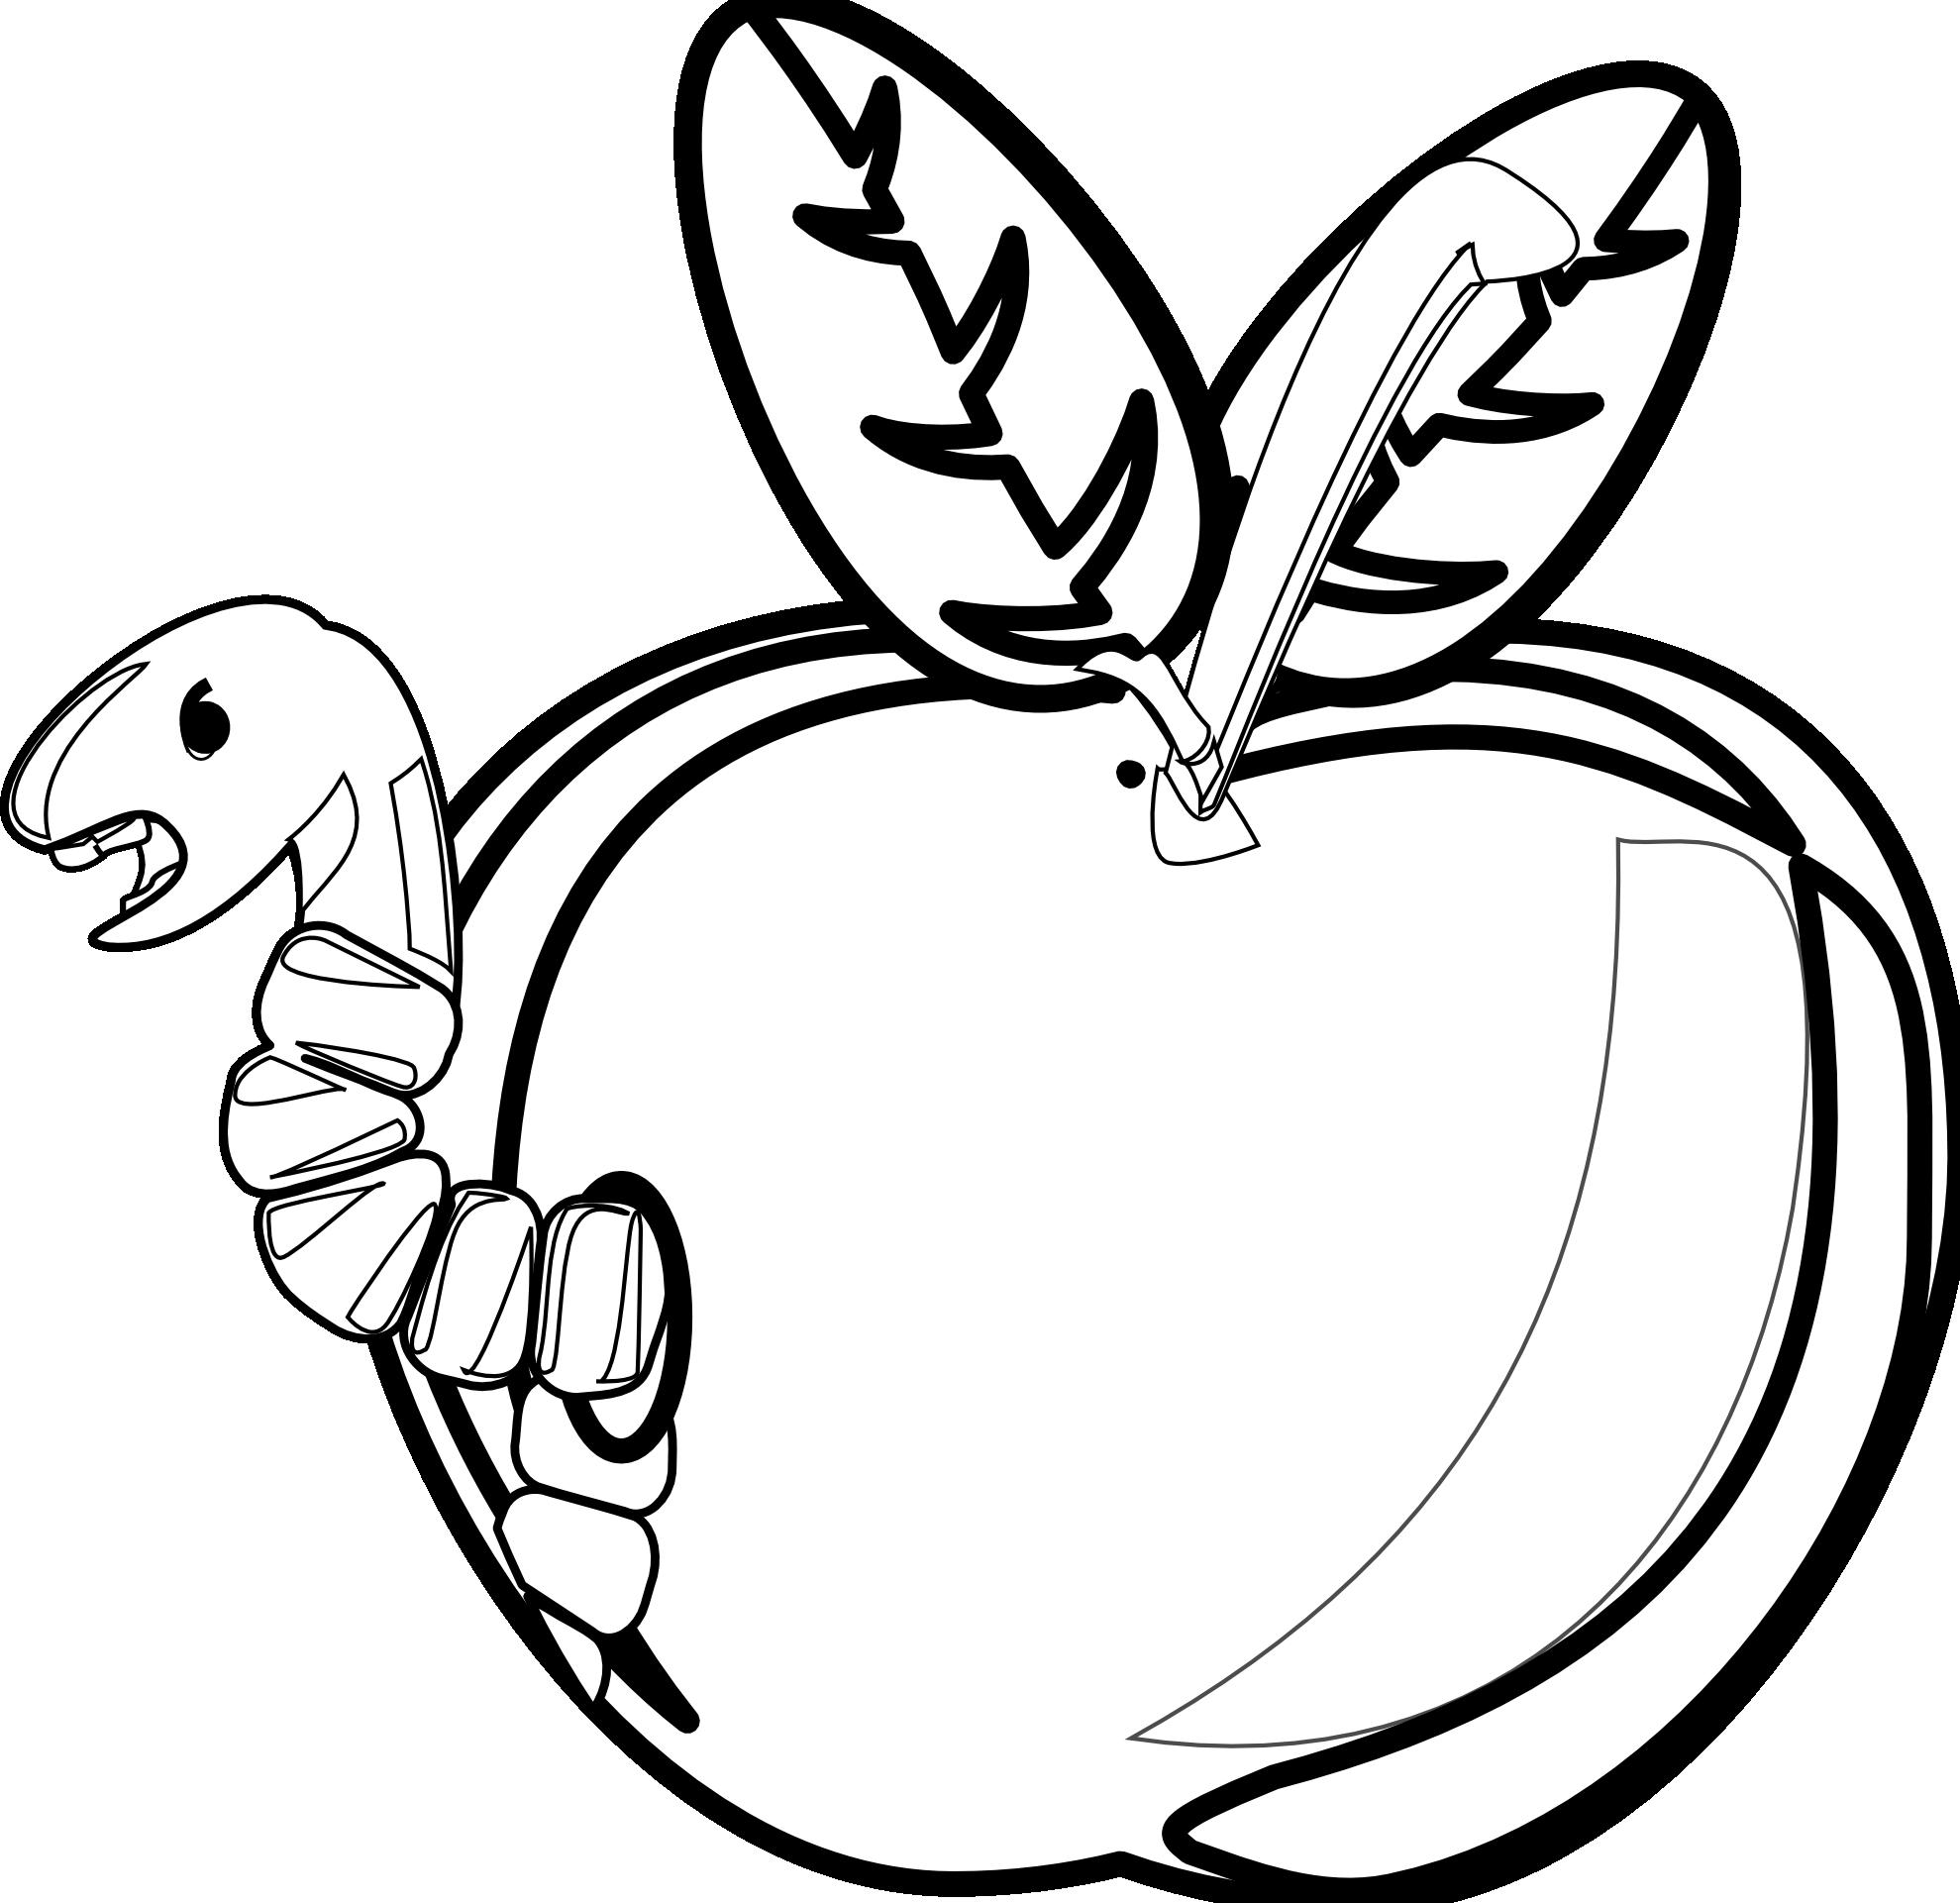 Similiar Black And White Cartoon Apple Keywords.